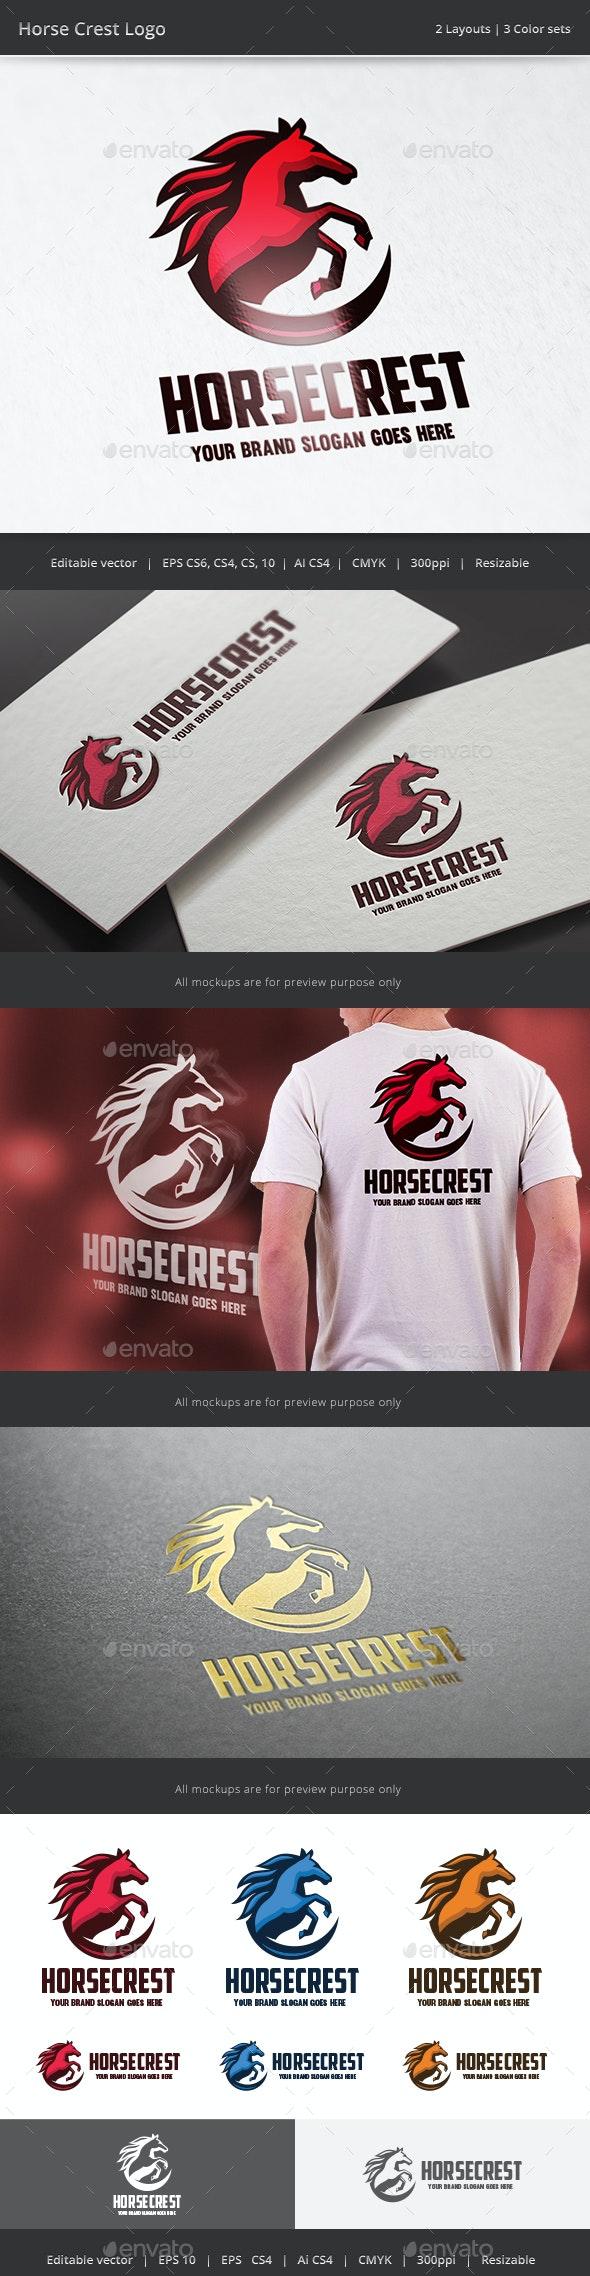 Horse Crest v2 Logo - Animals Logo Templates